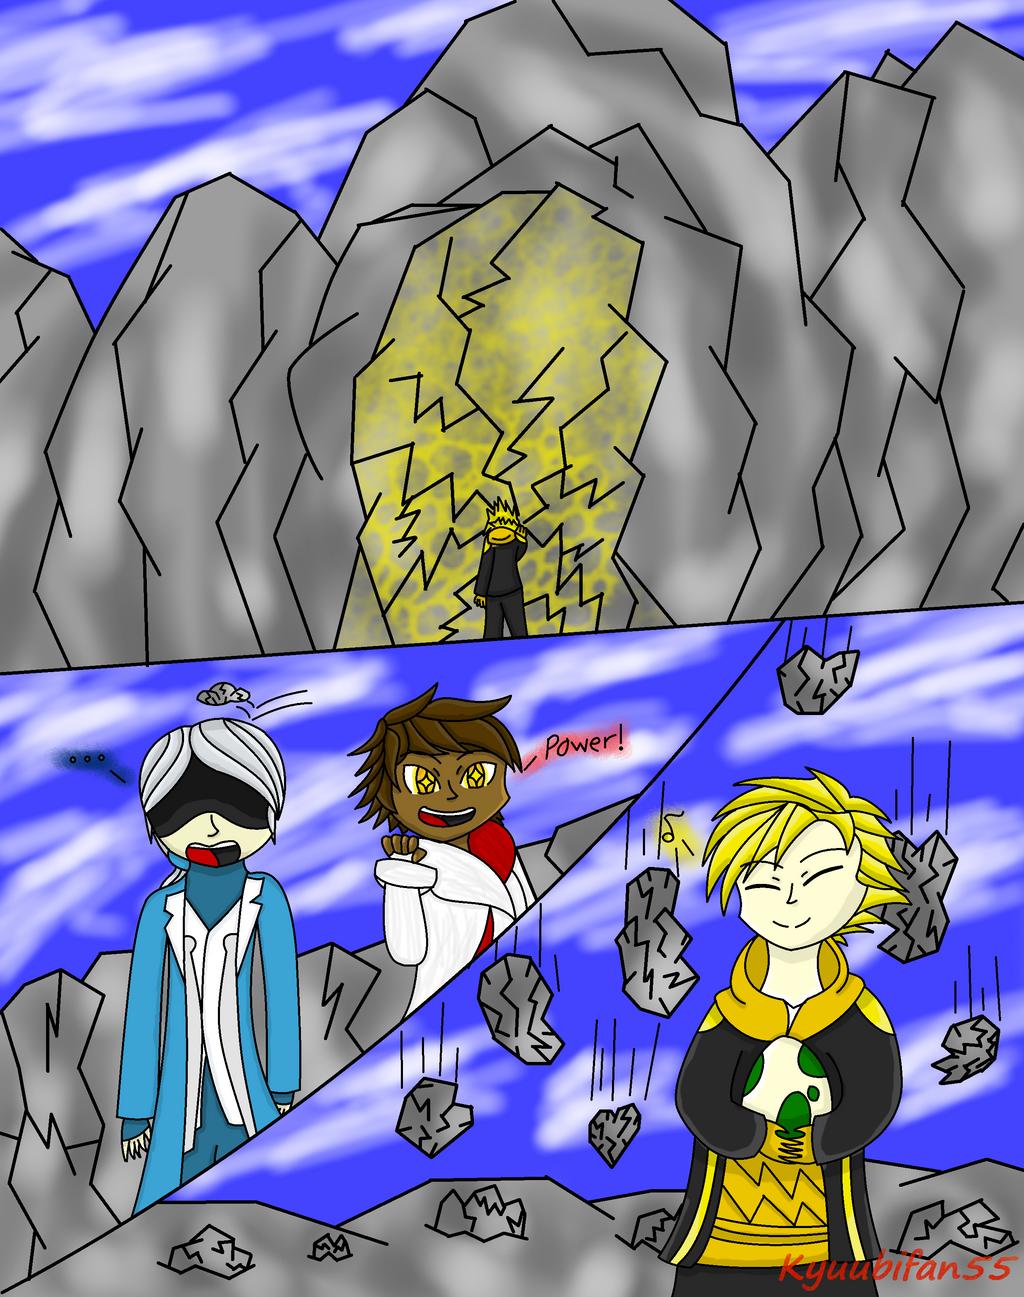 pokemon go comic spark s strength by kyuubifan55 on deviantart